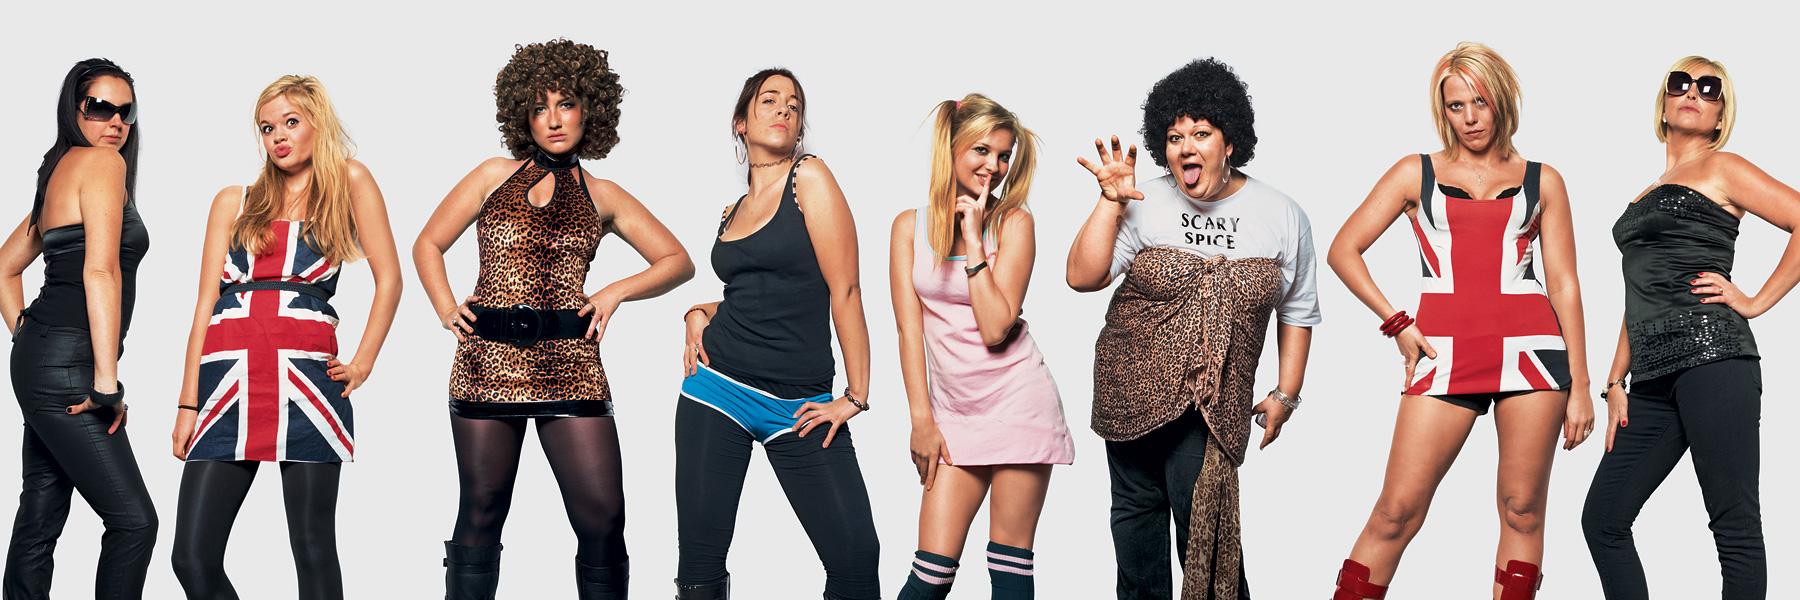 SpiceGirls 17 Музыка нас связала